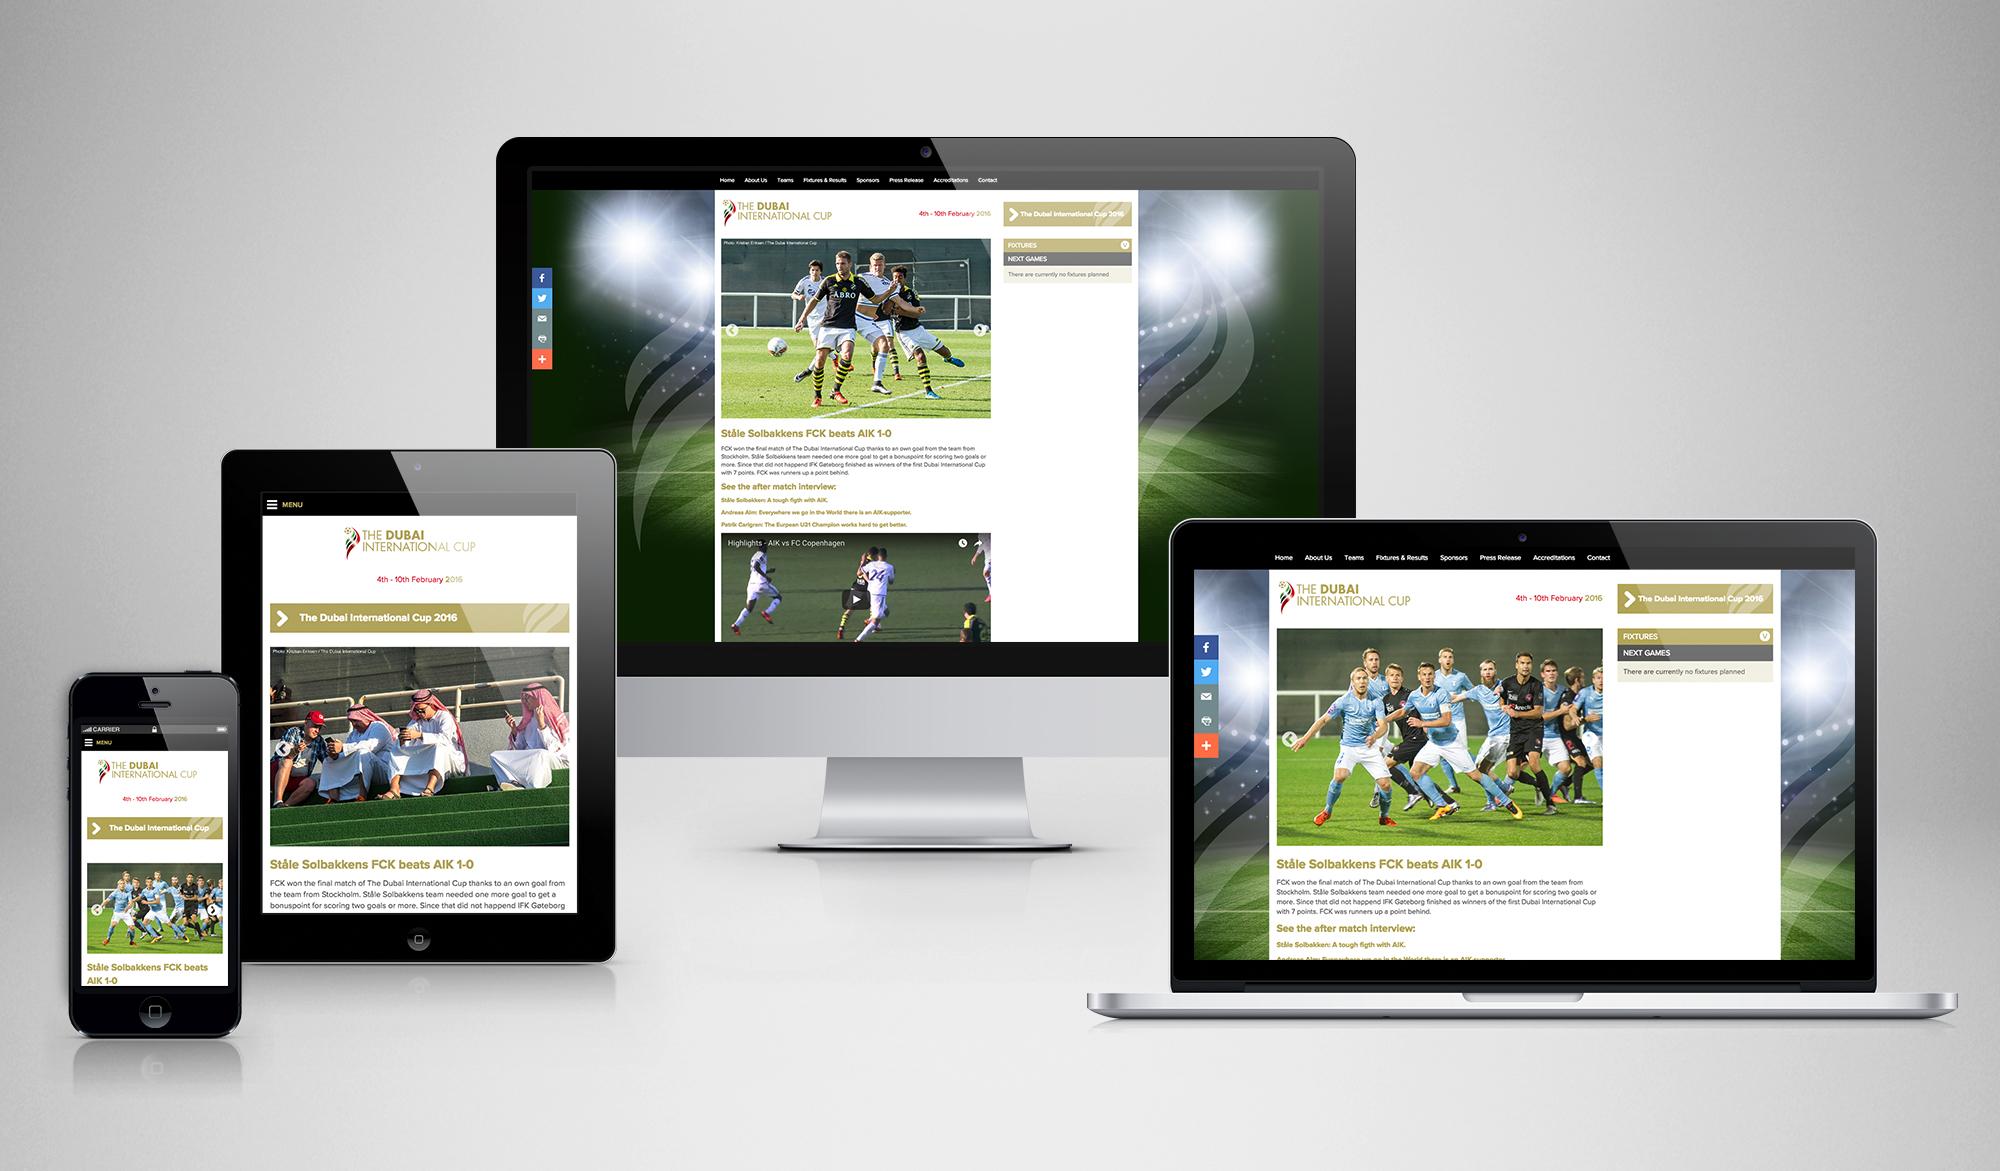 The Dubai International Cup responsive website